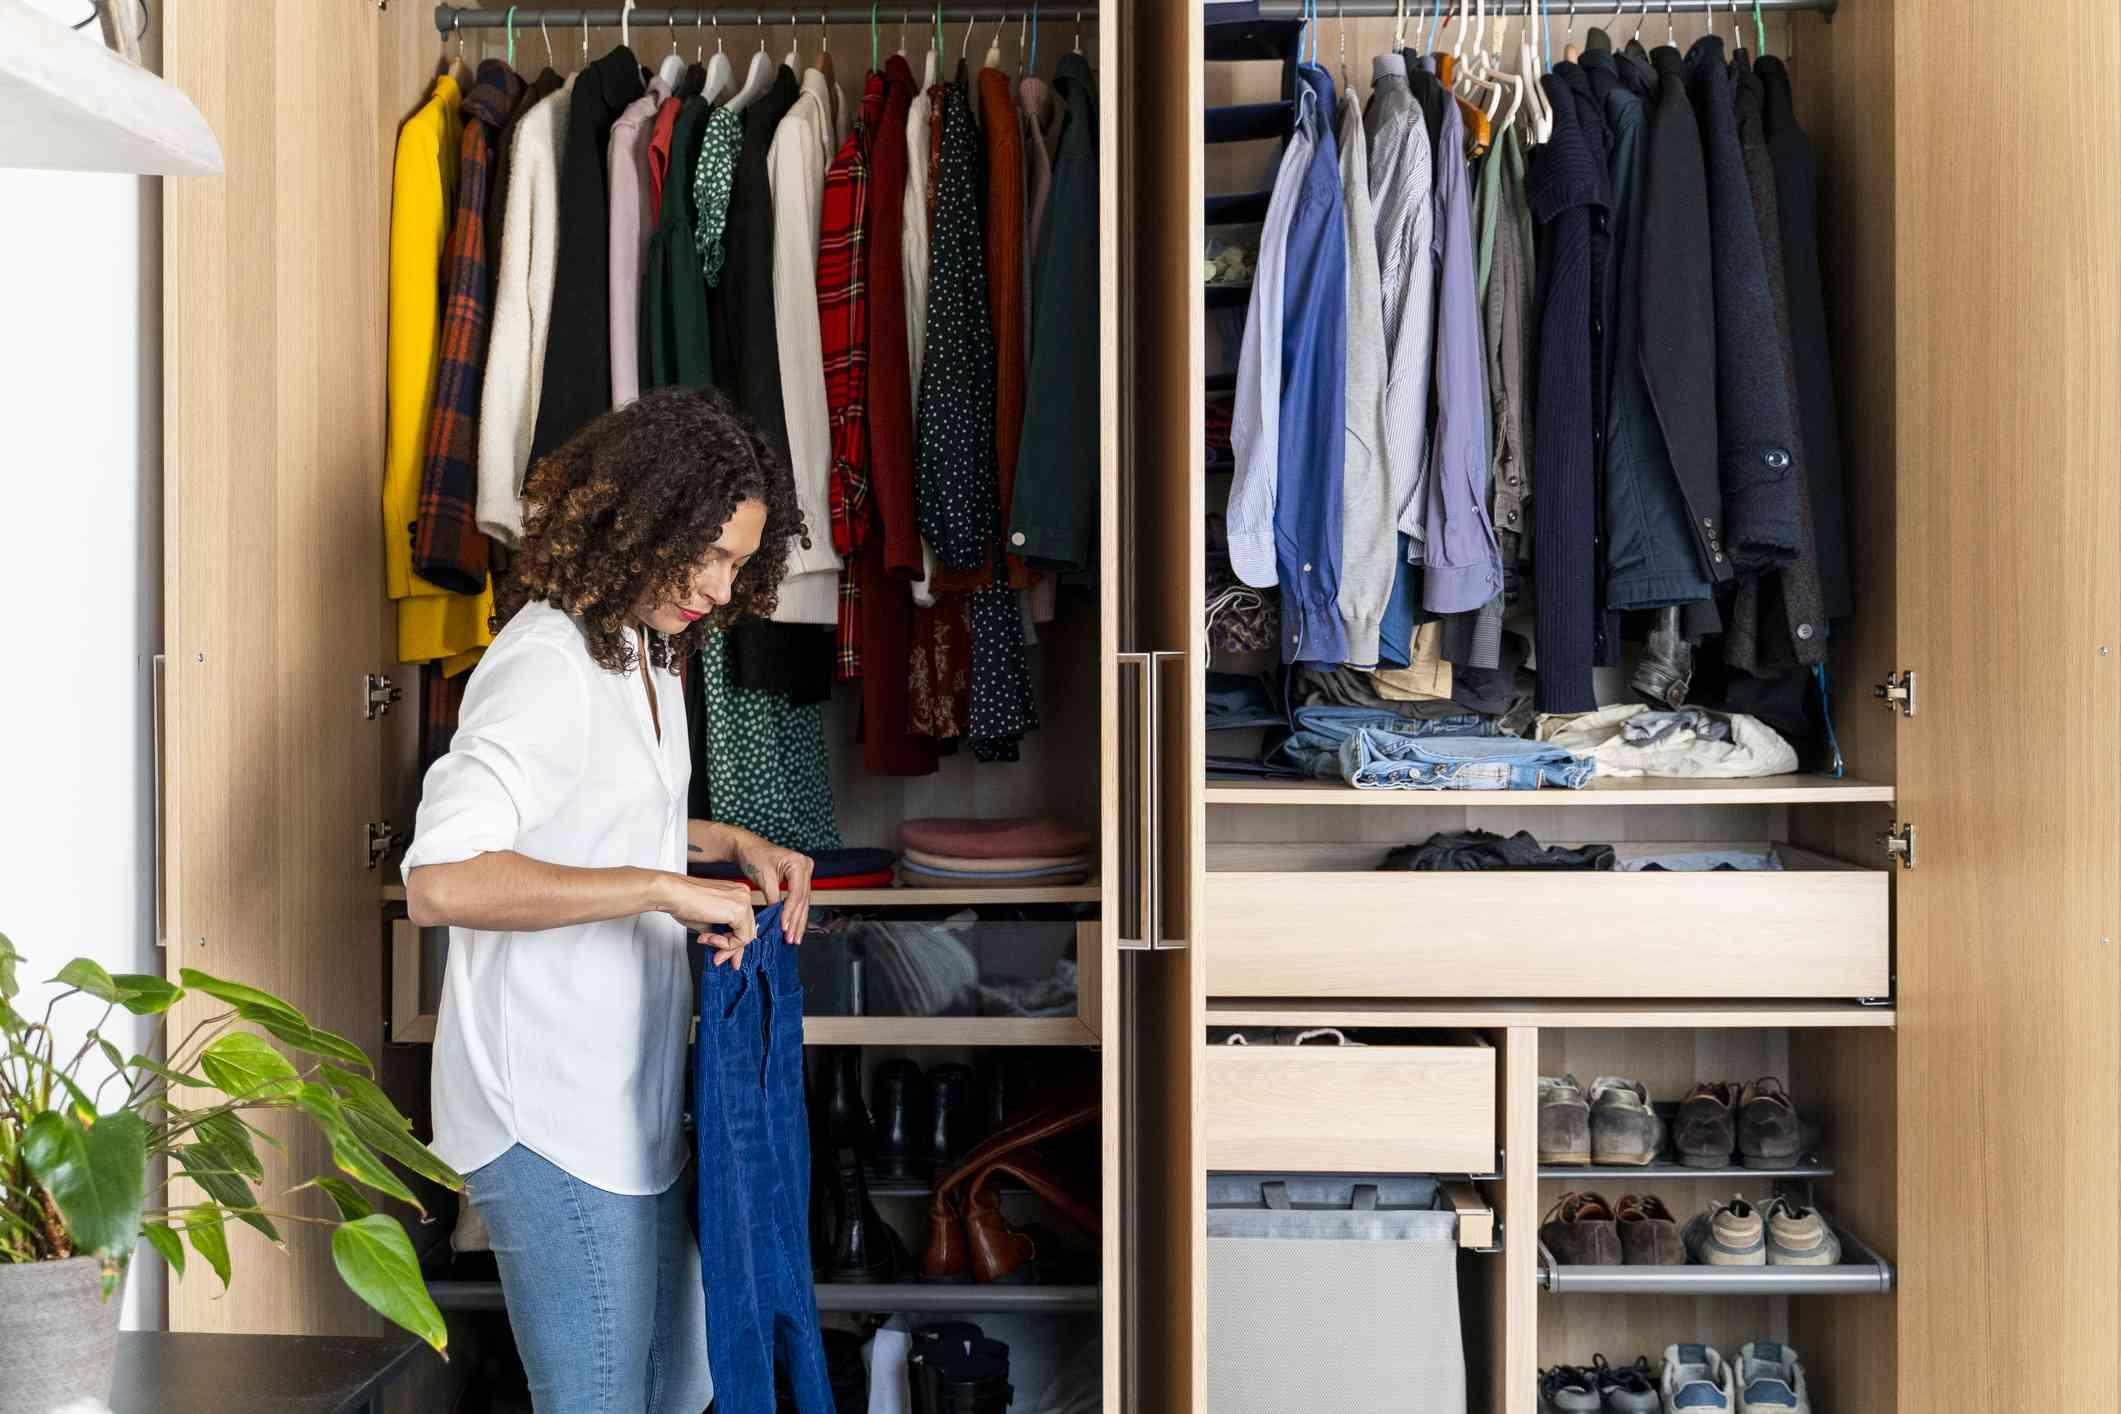 Woman organizes closet